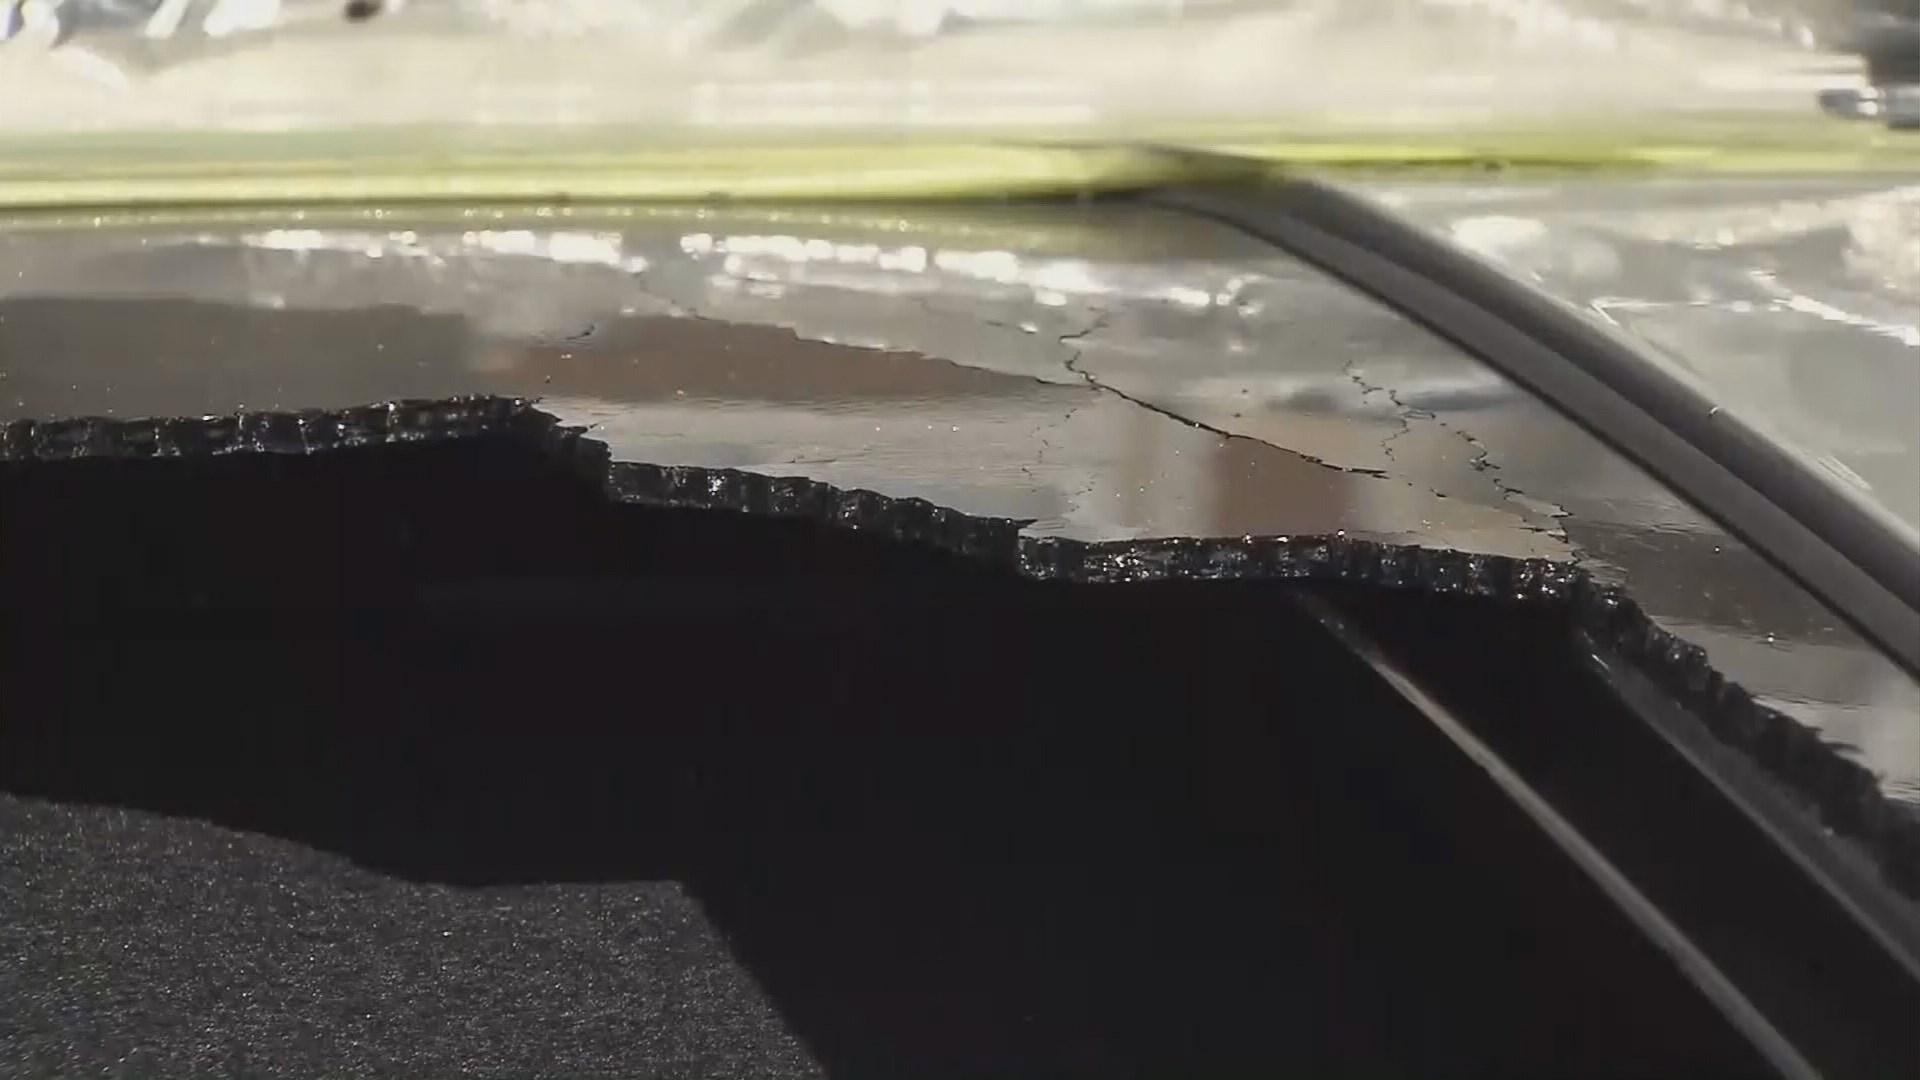 Zašto panorama krovna stakla masovno pucaju?